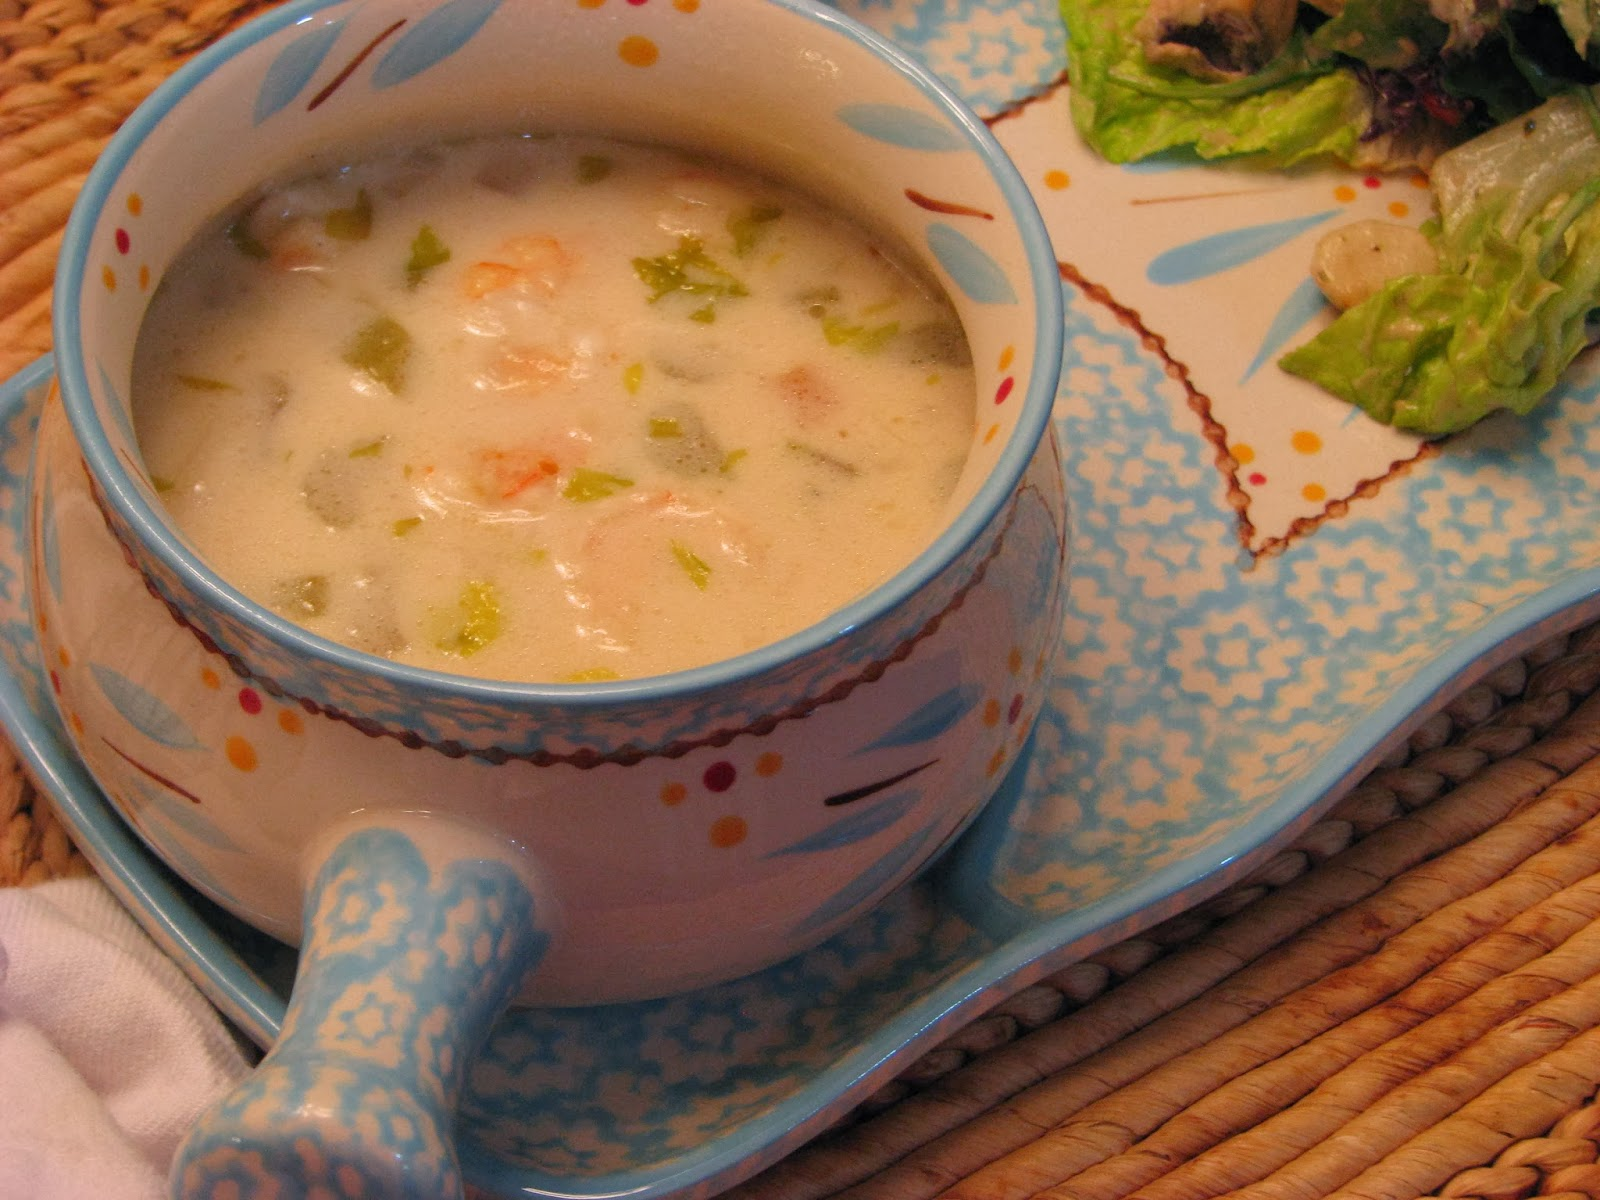 Thefultongirls slow cooker fish chowder for Crockpot fish chowder